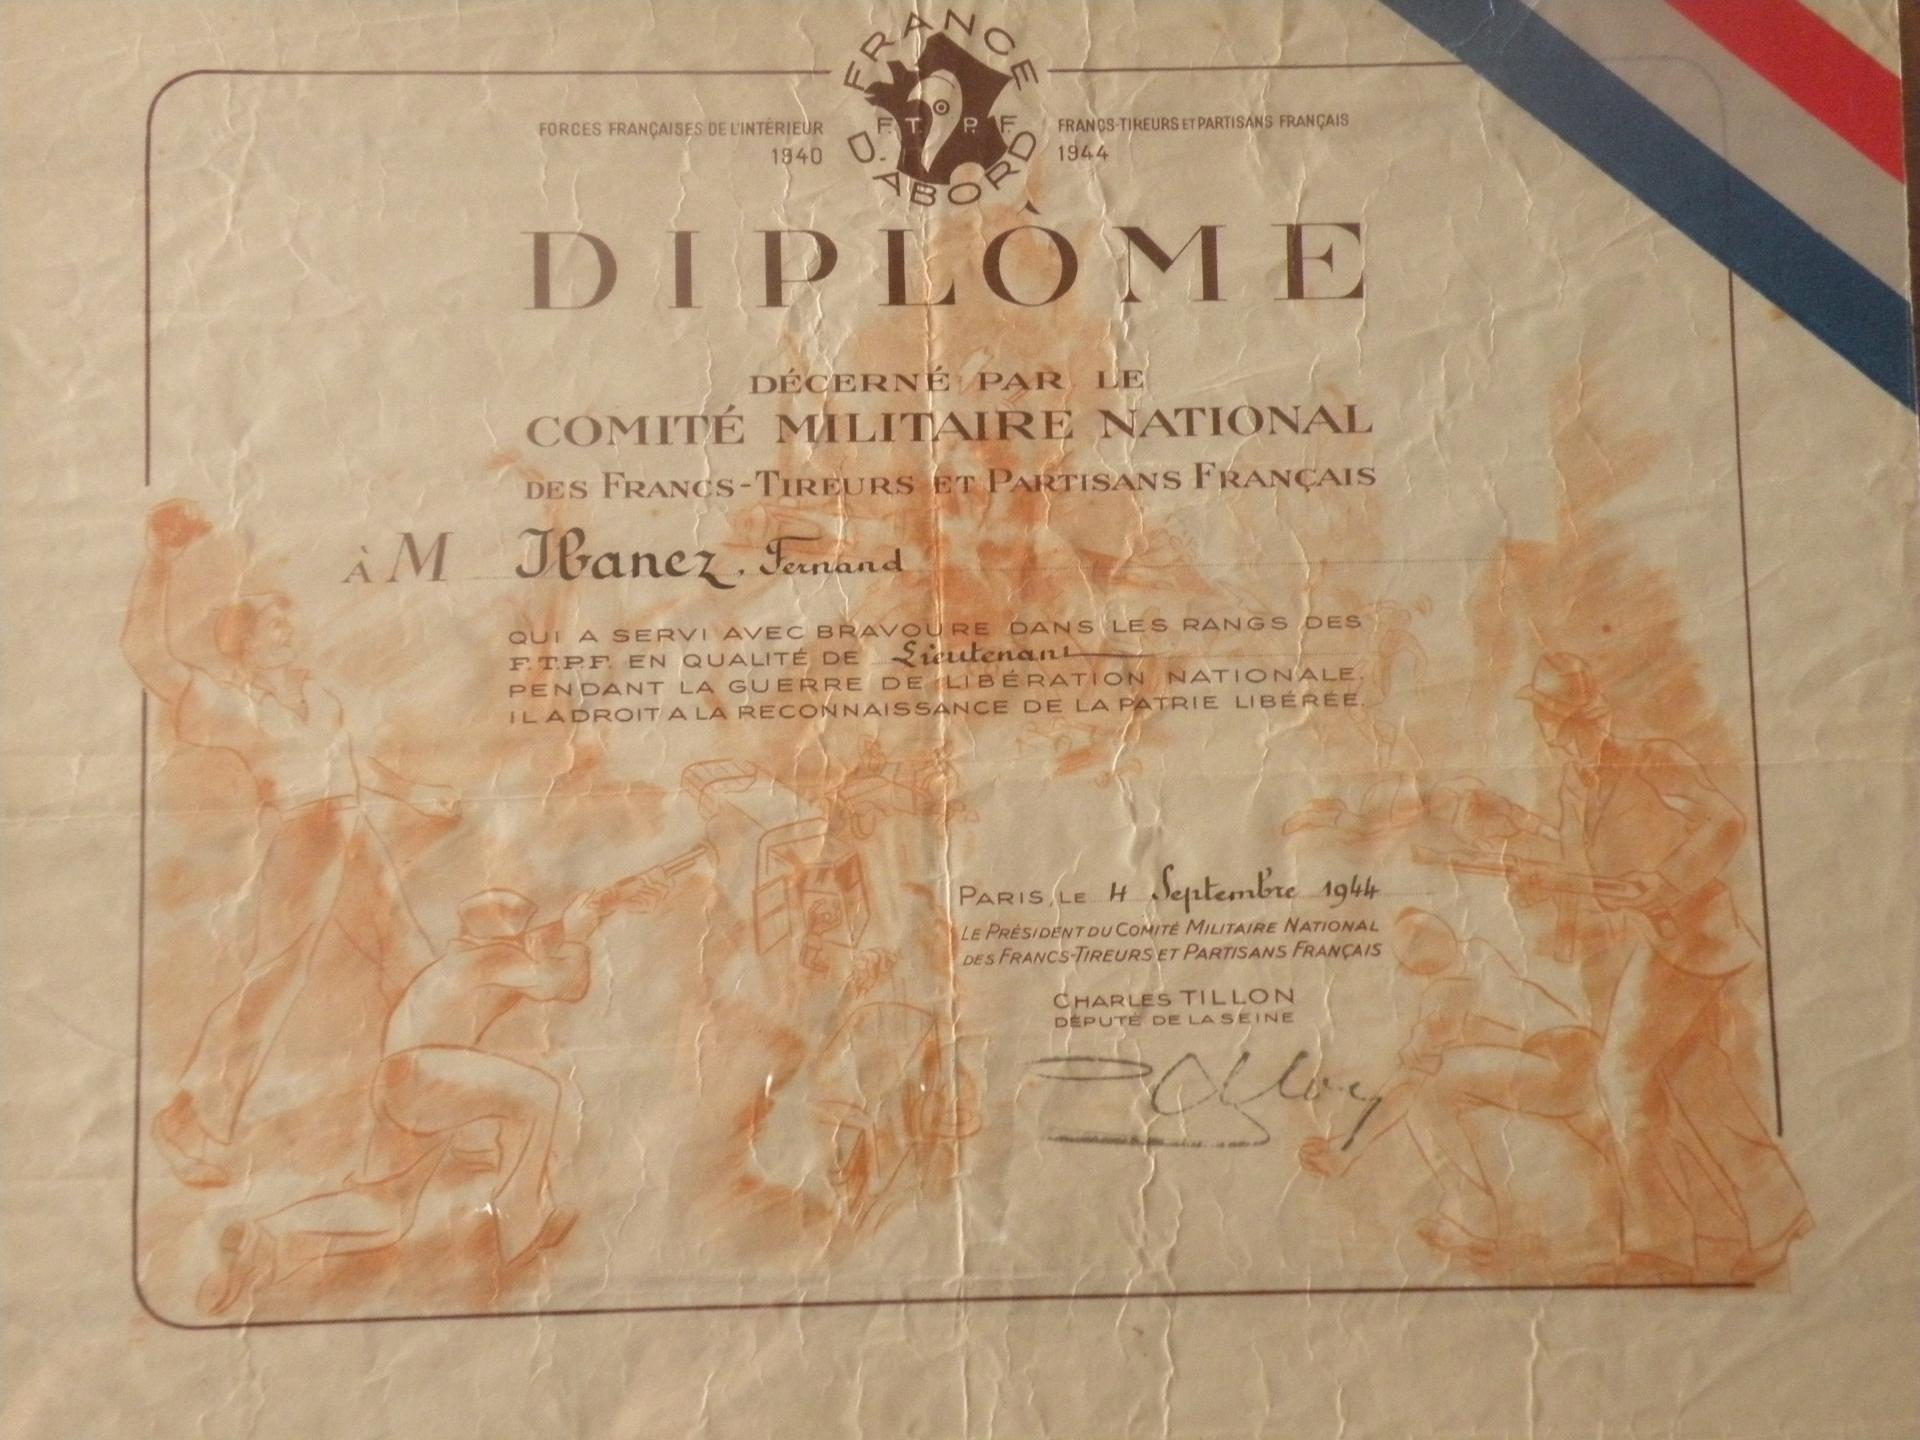 Diplome Fernand Ibanez